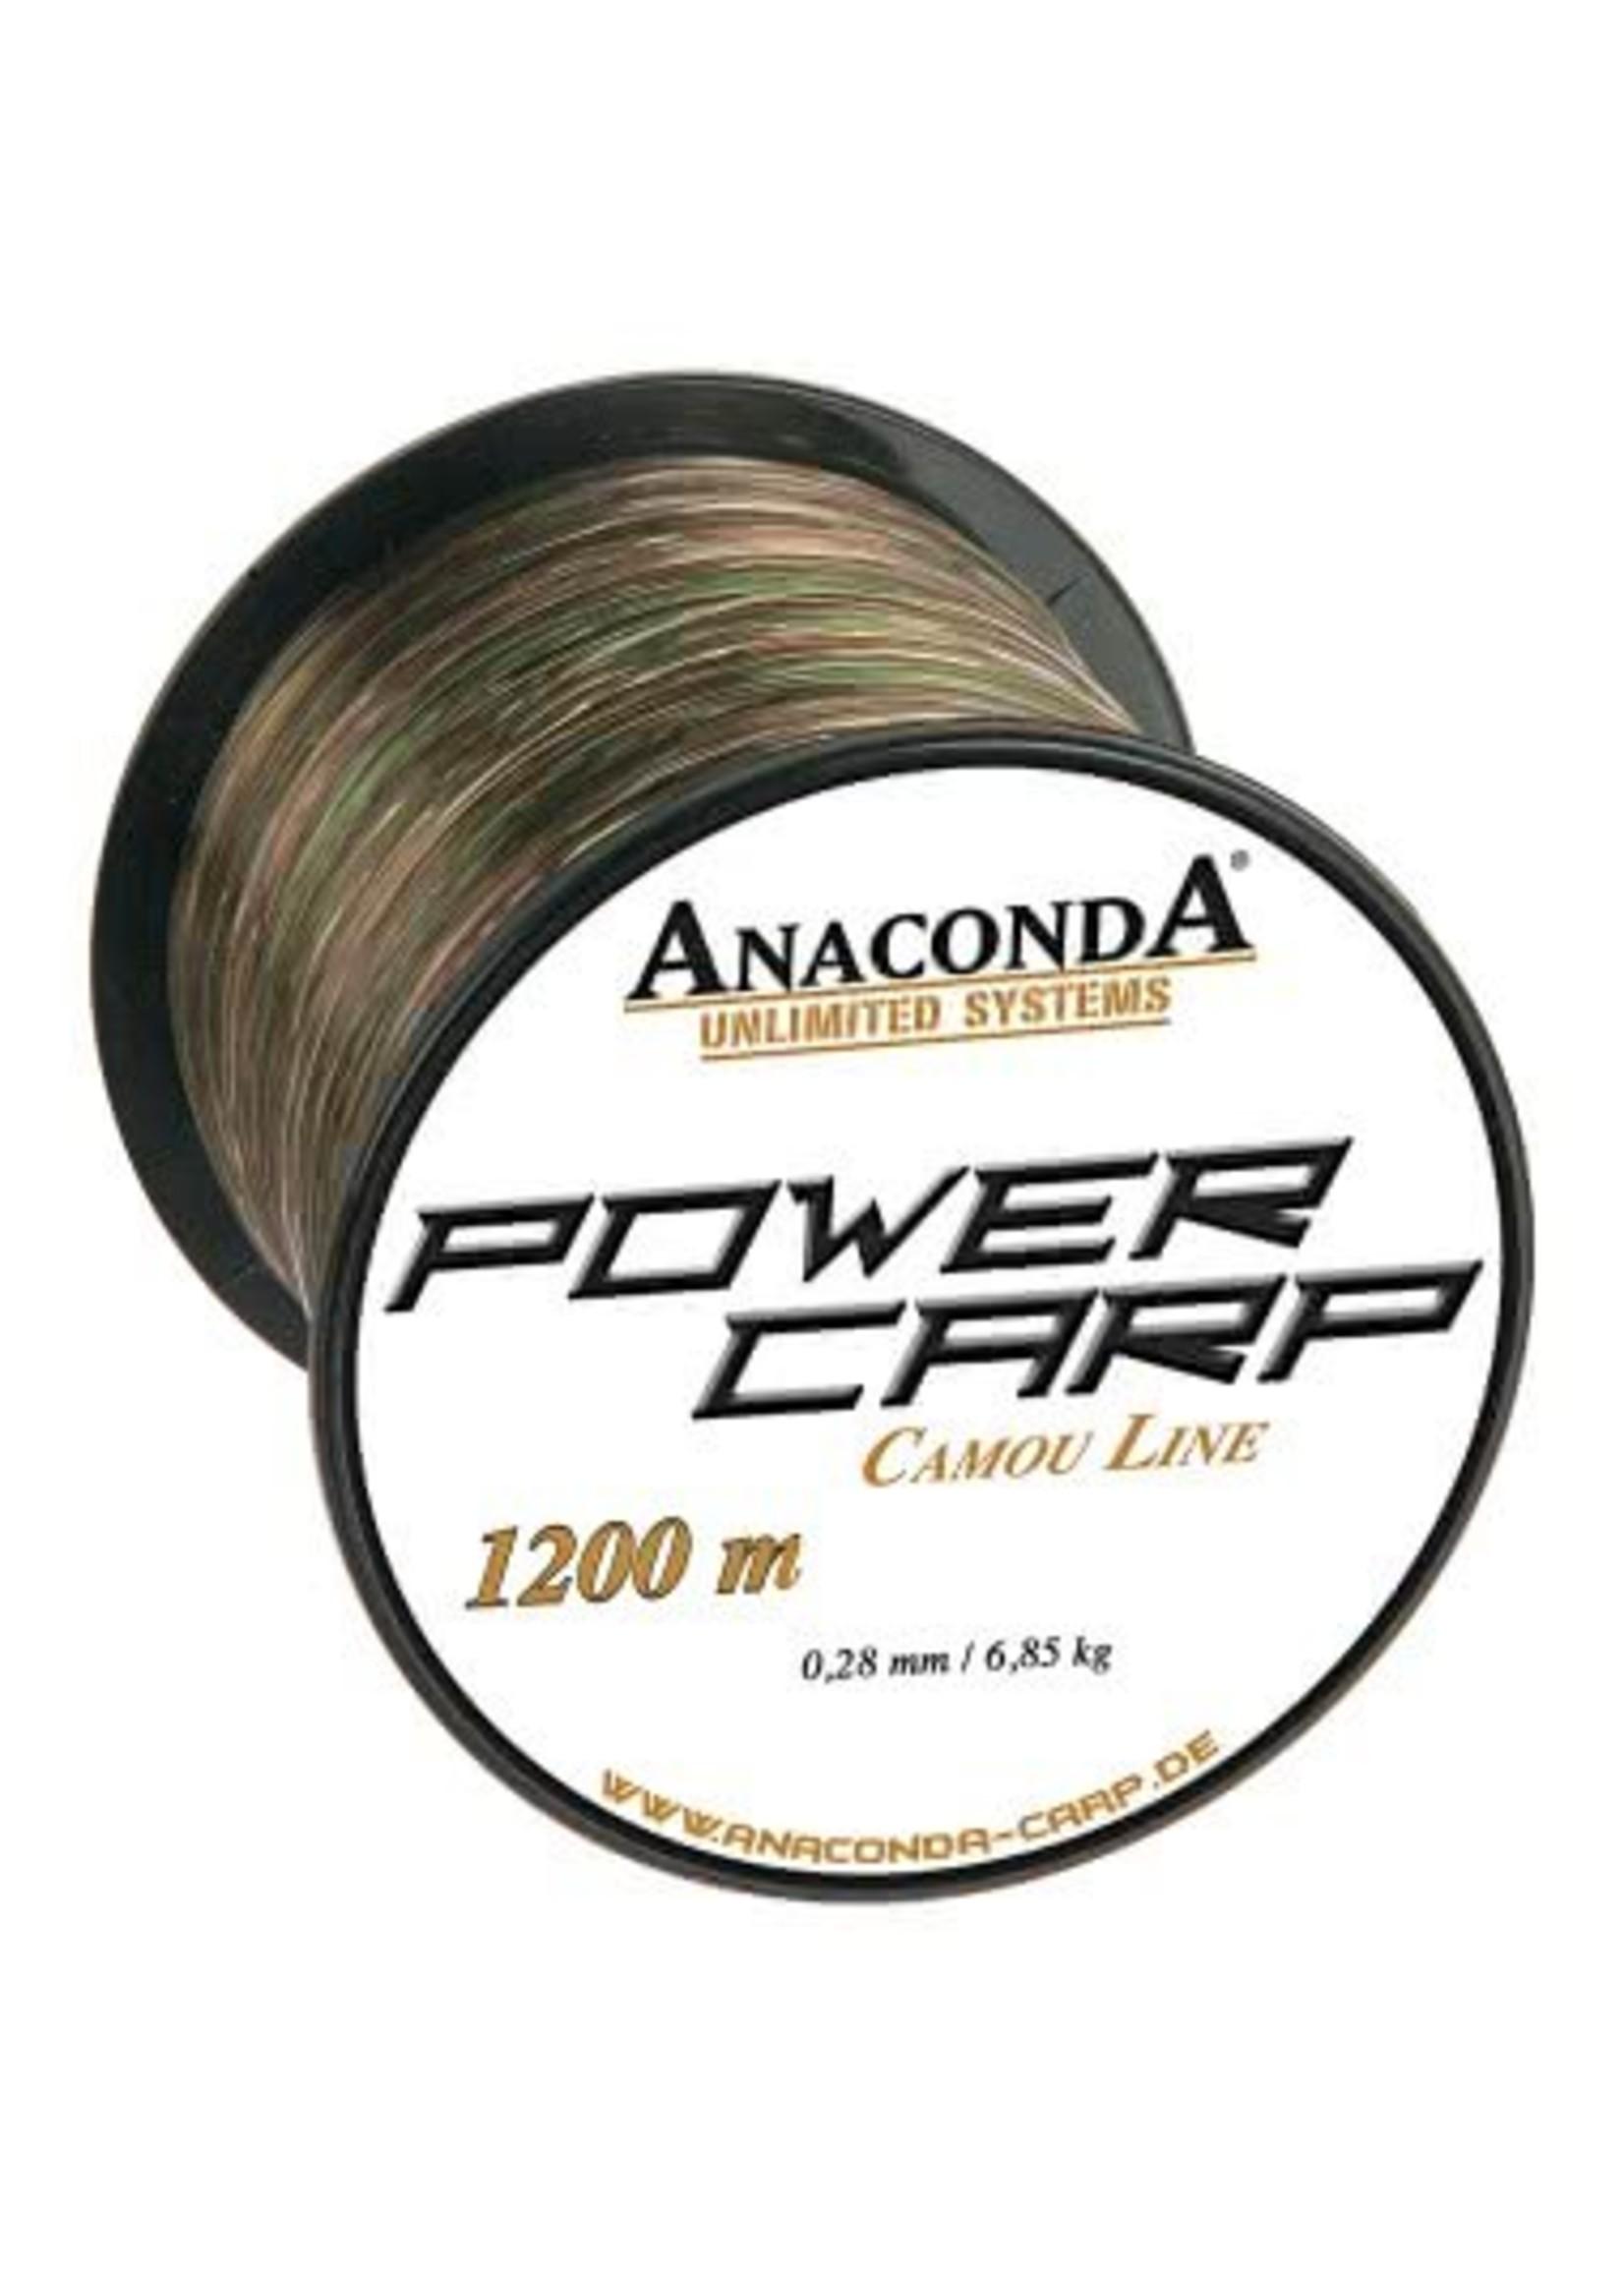 Anaconda Anaconda power carp camo lijn